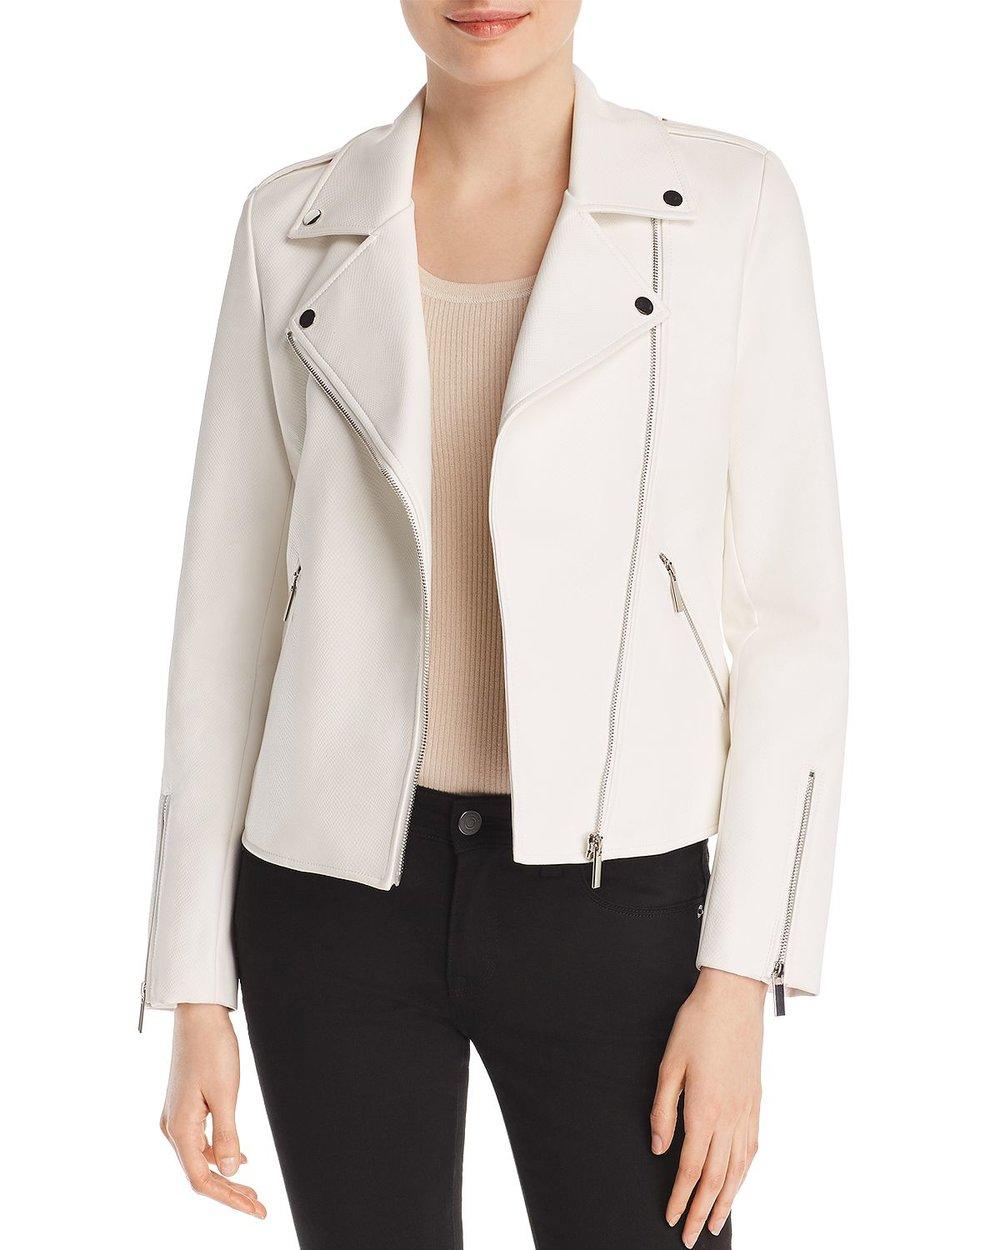 white faux leather jacket.jpg